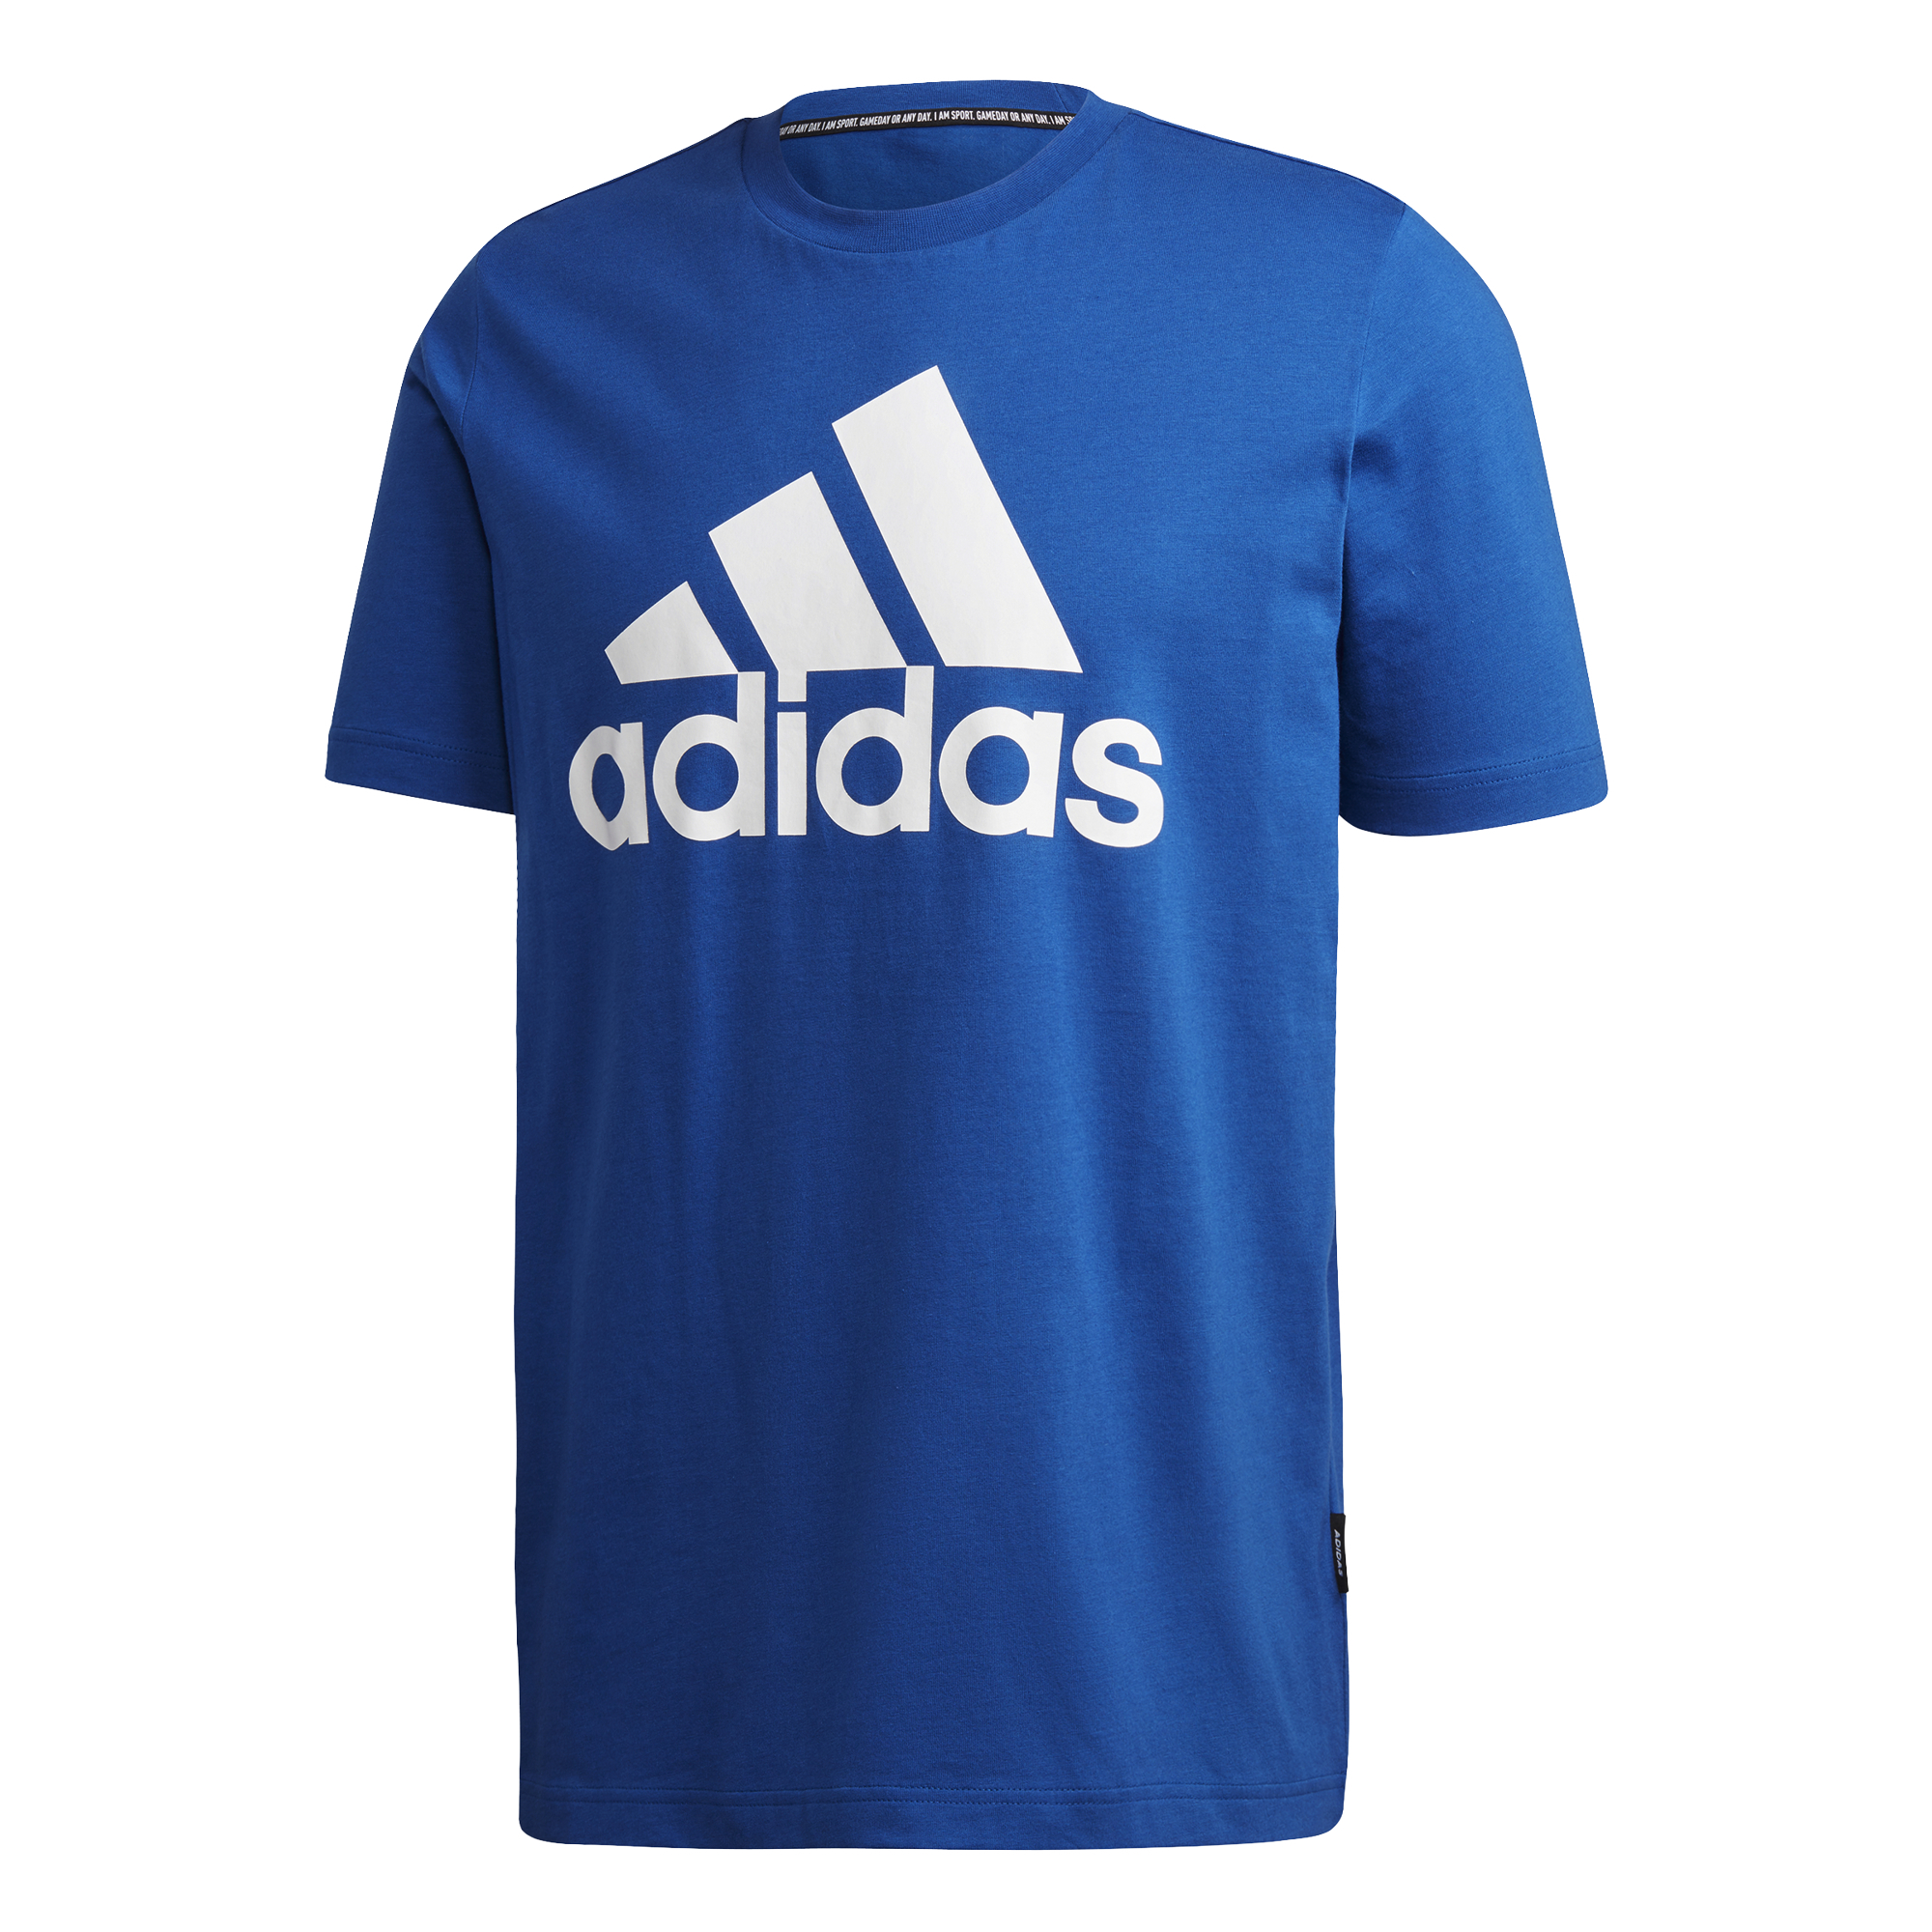 Camiseta Adidas MH Bos Tee GK4994